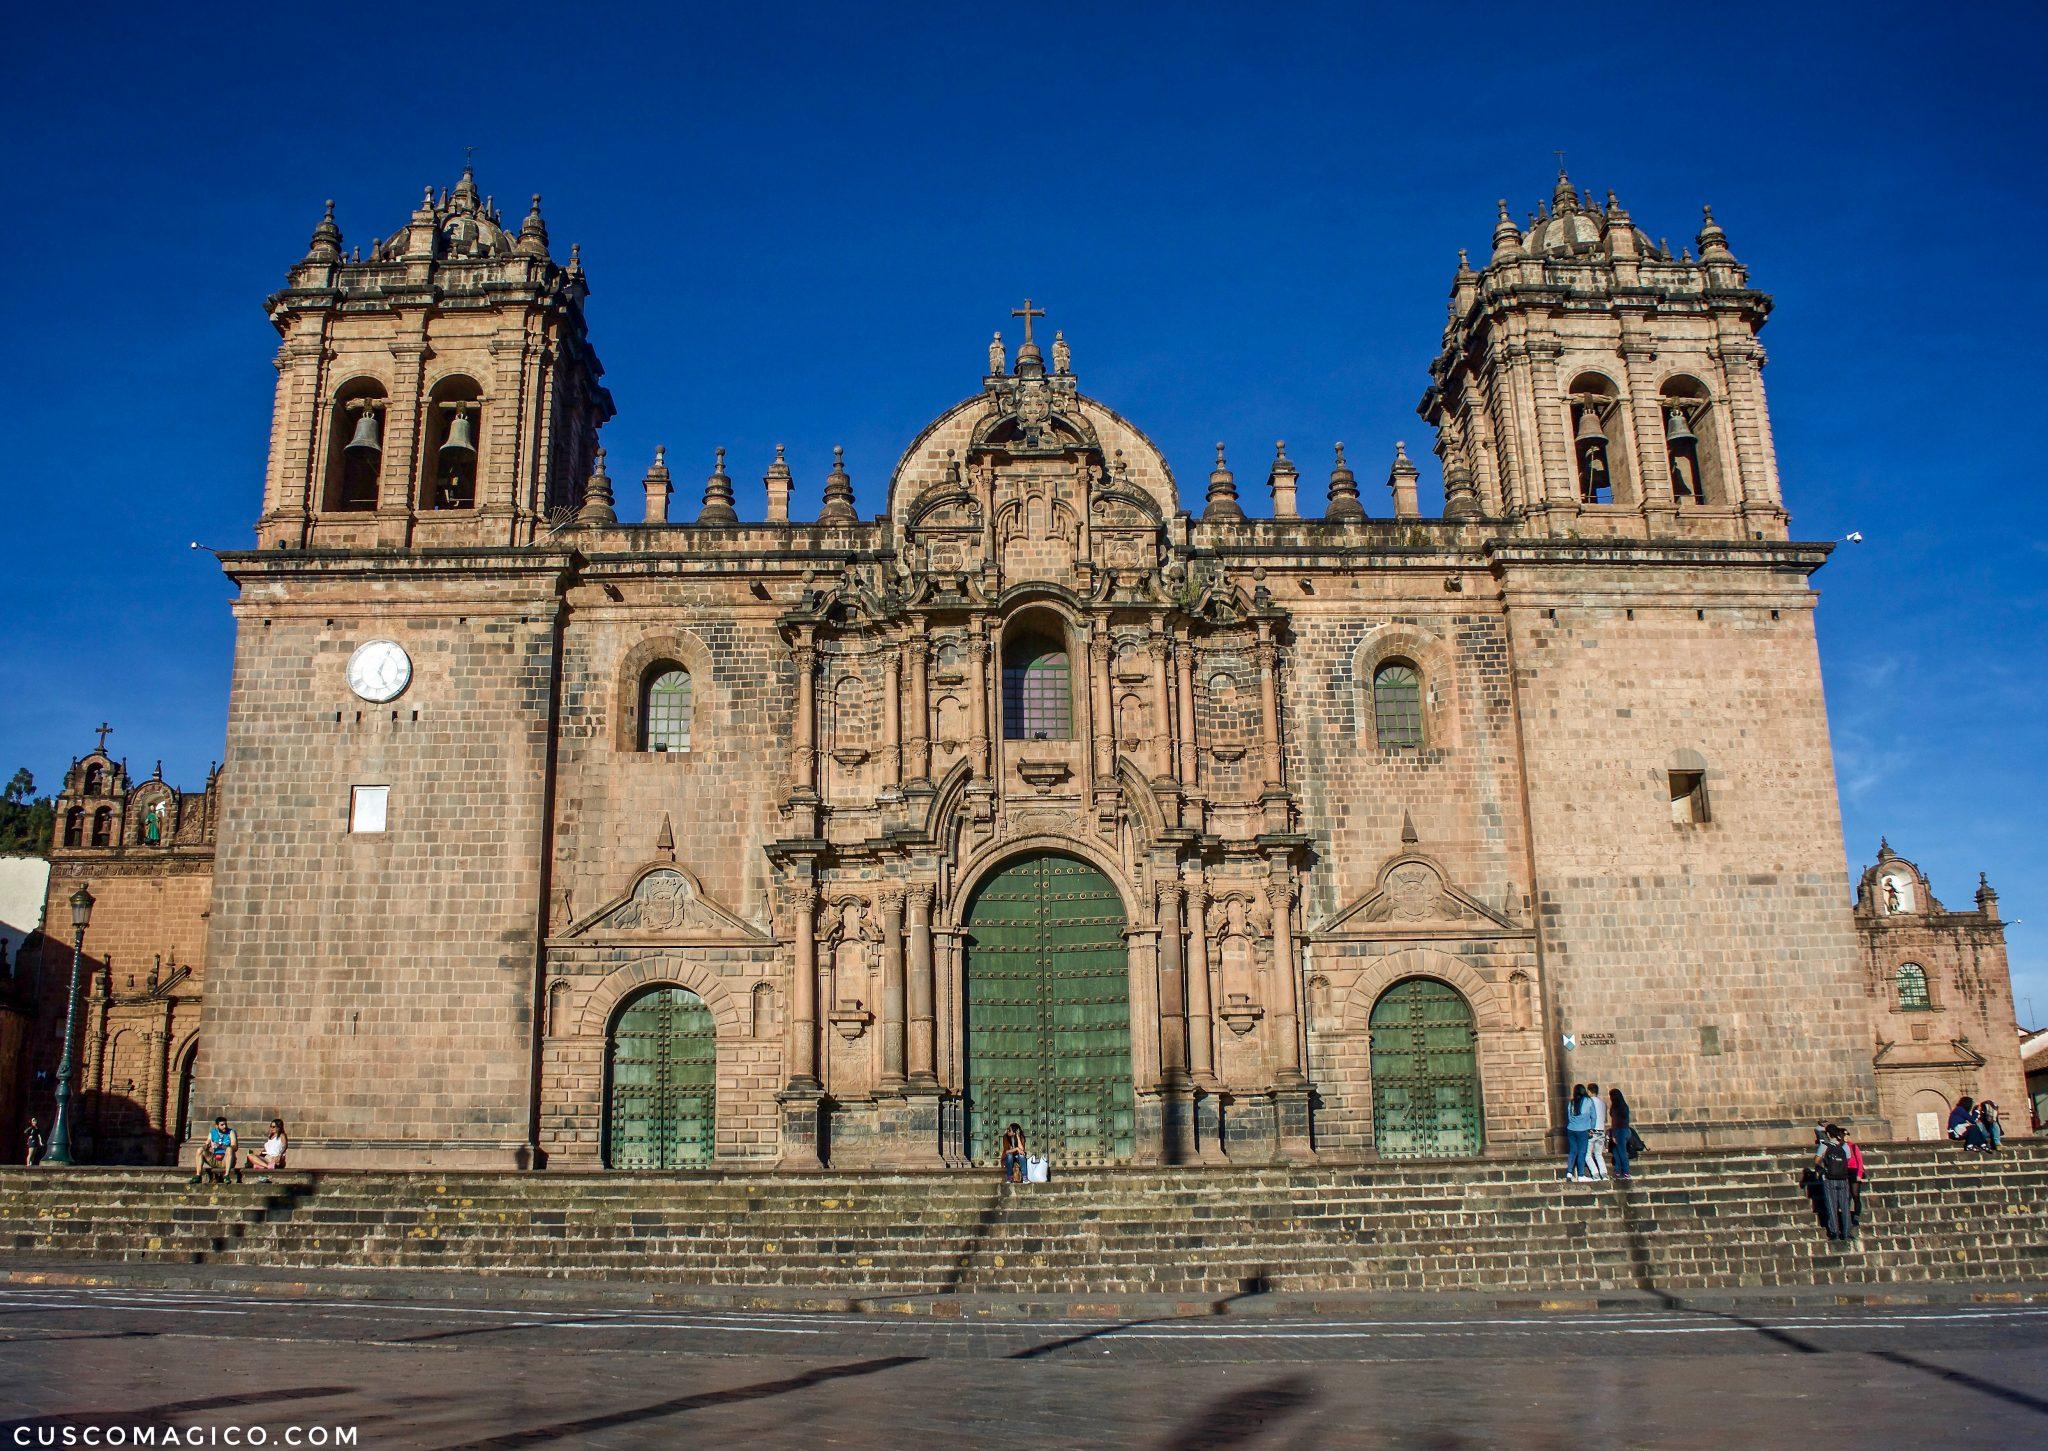 Basílica Catedral del Cusco